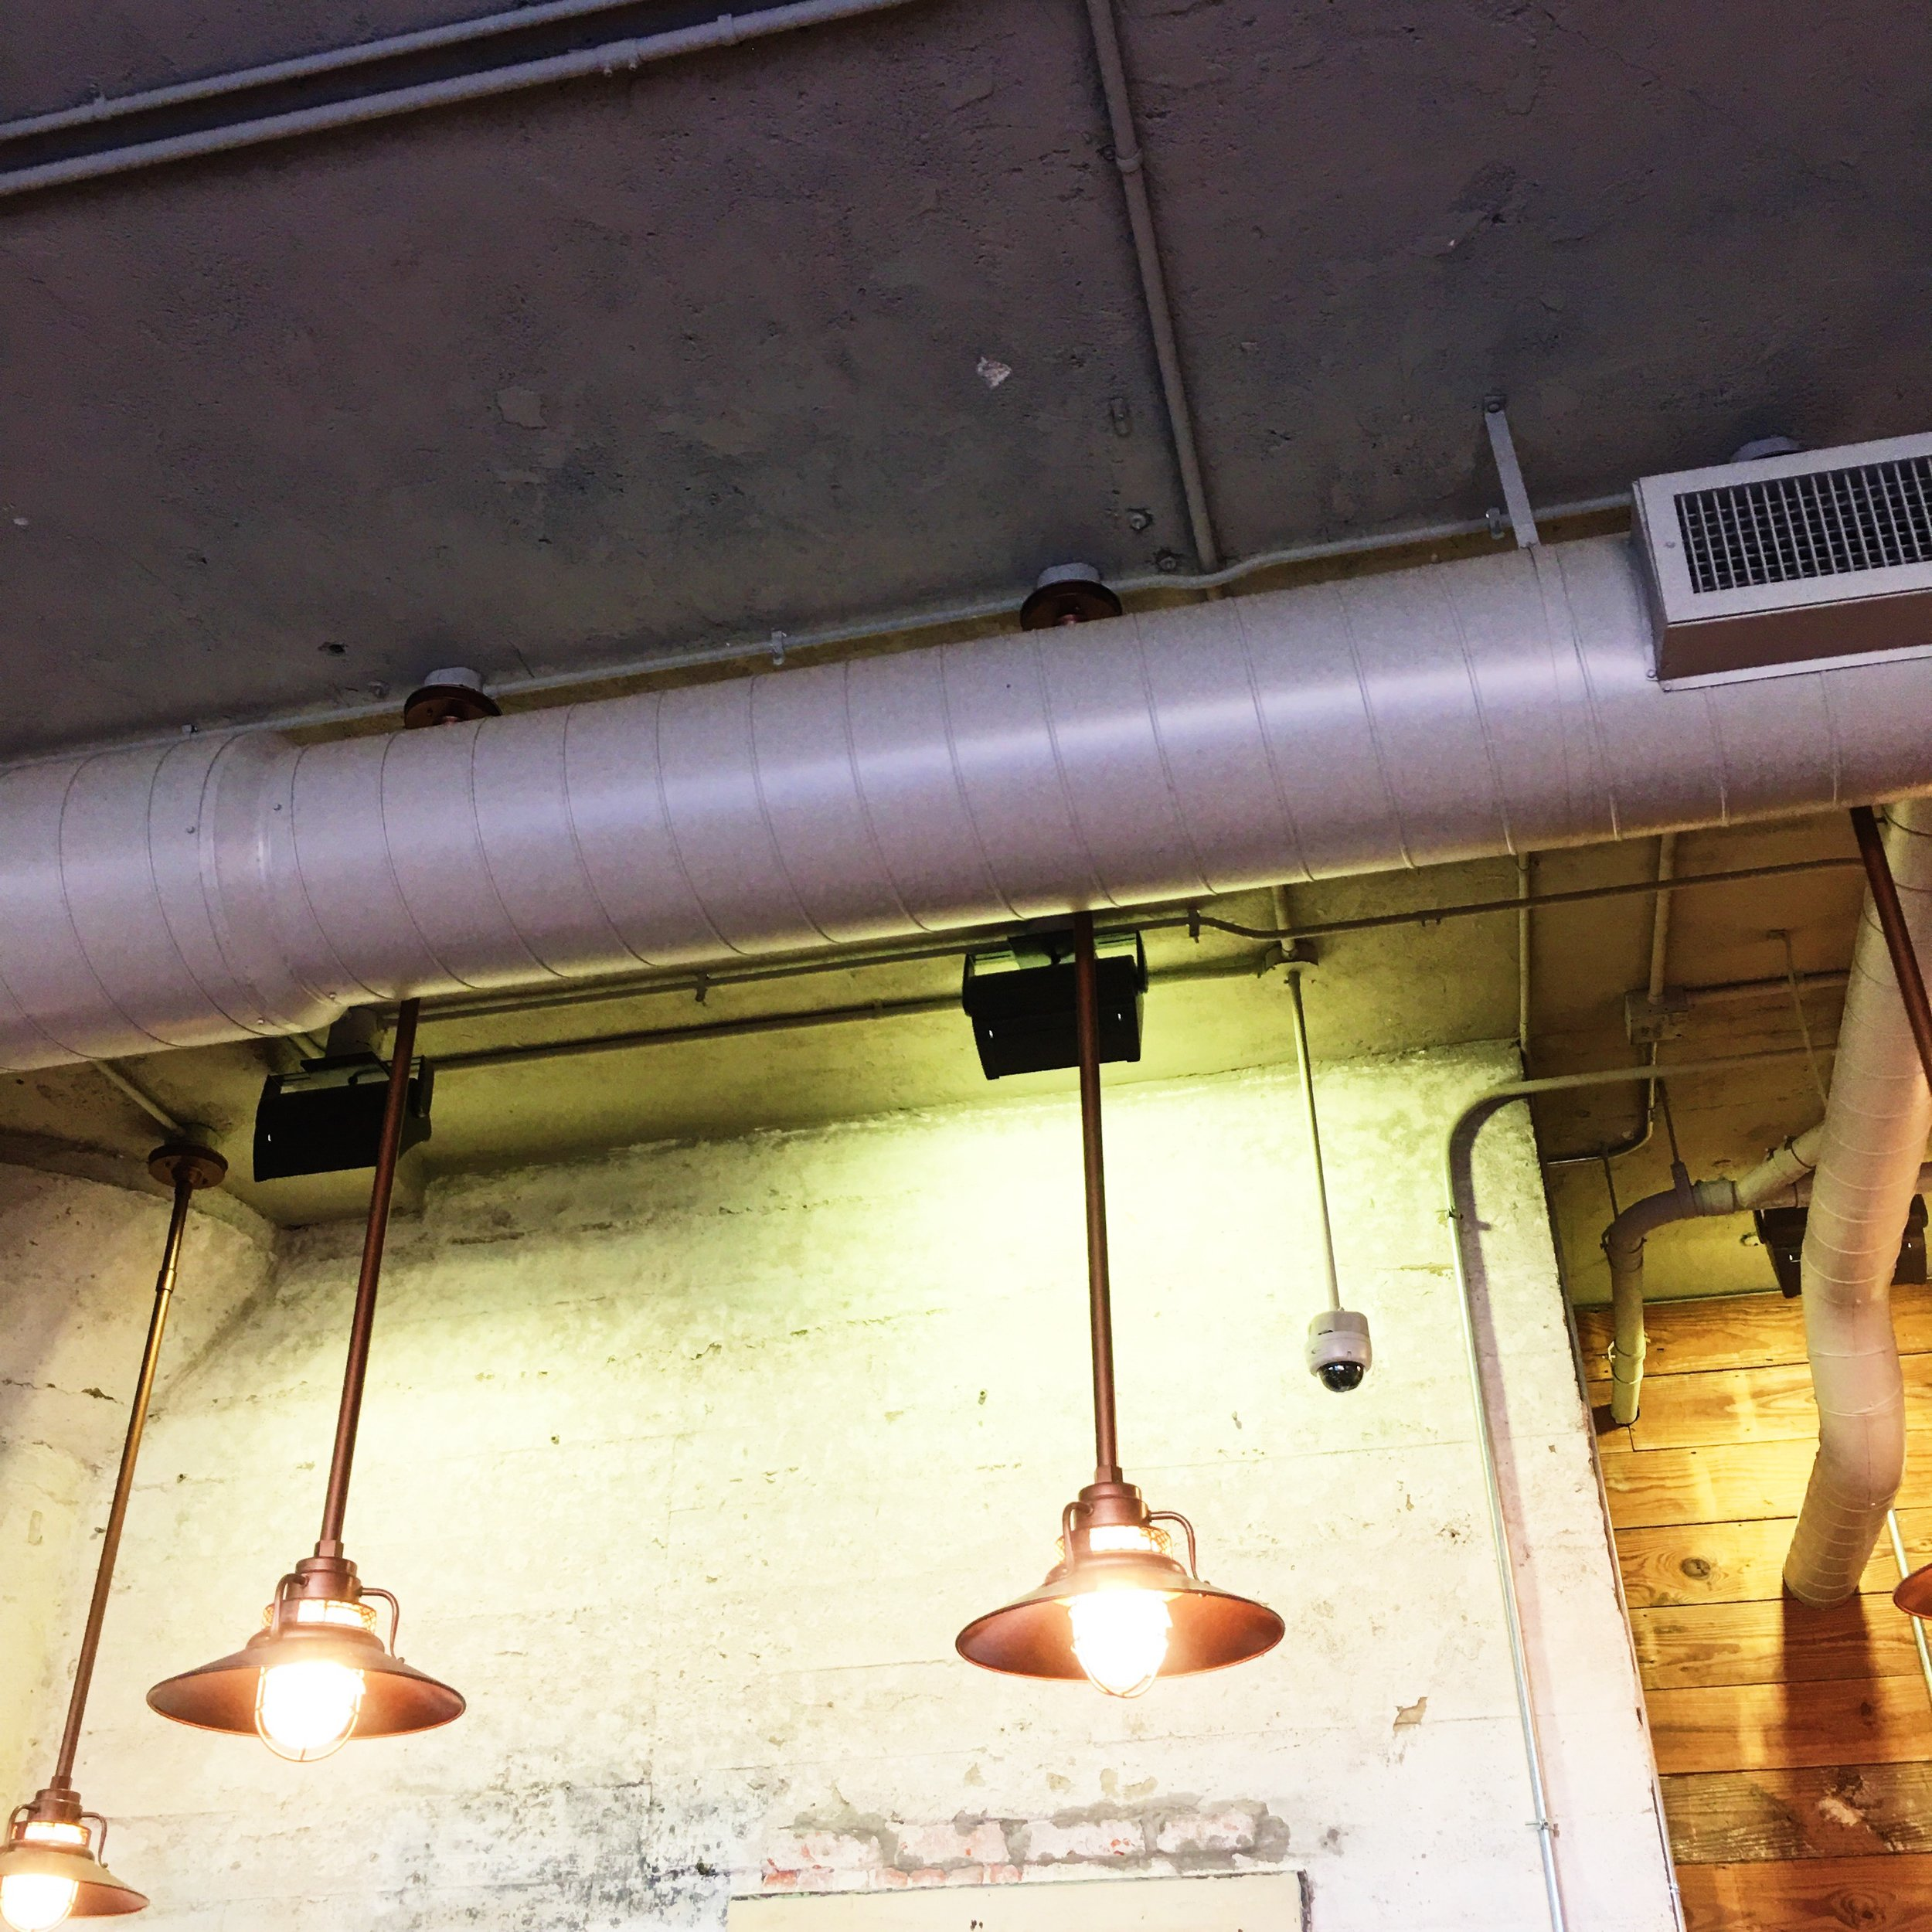 Balcones Whiskey - Things to do in Waco - Wander Dust Blog  (4).JPG